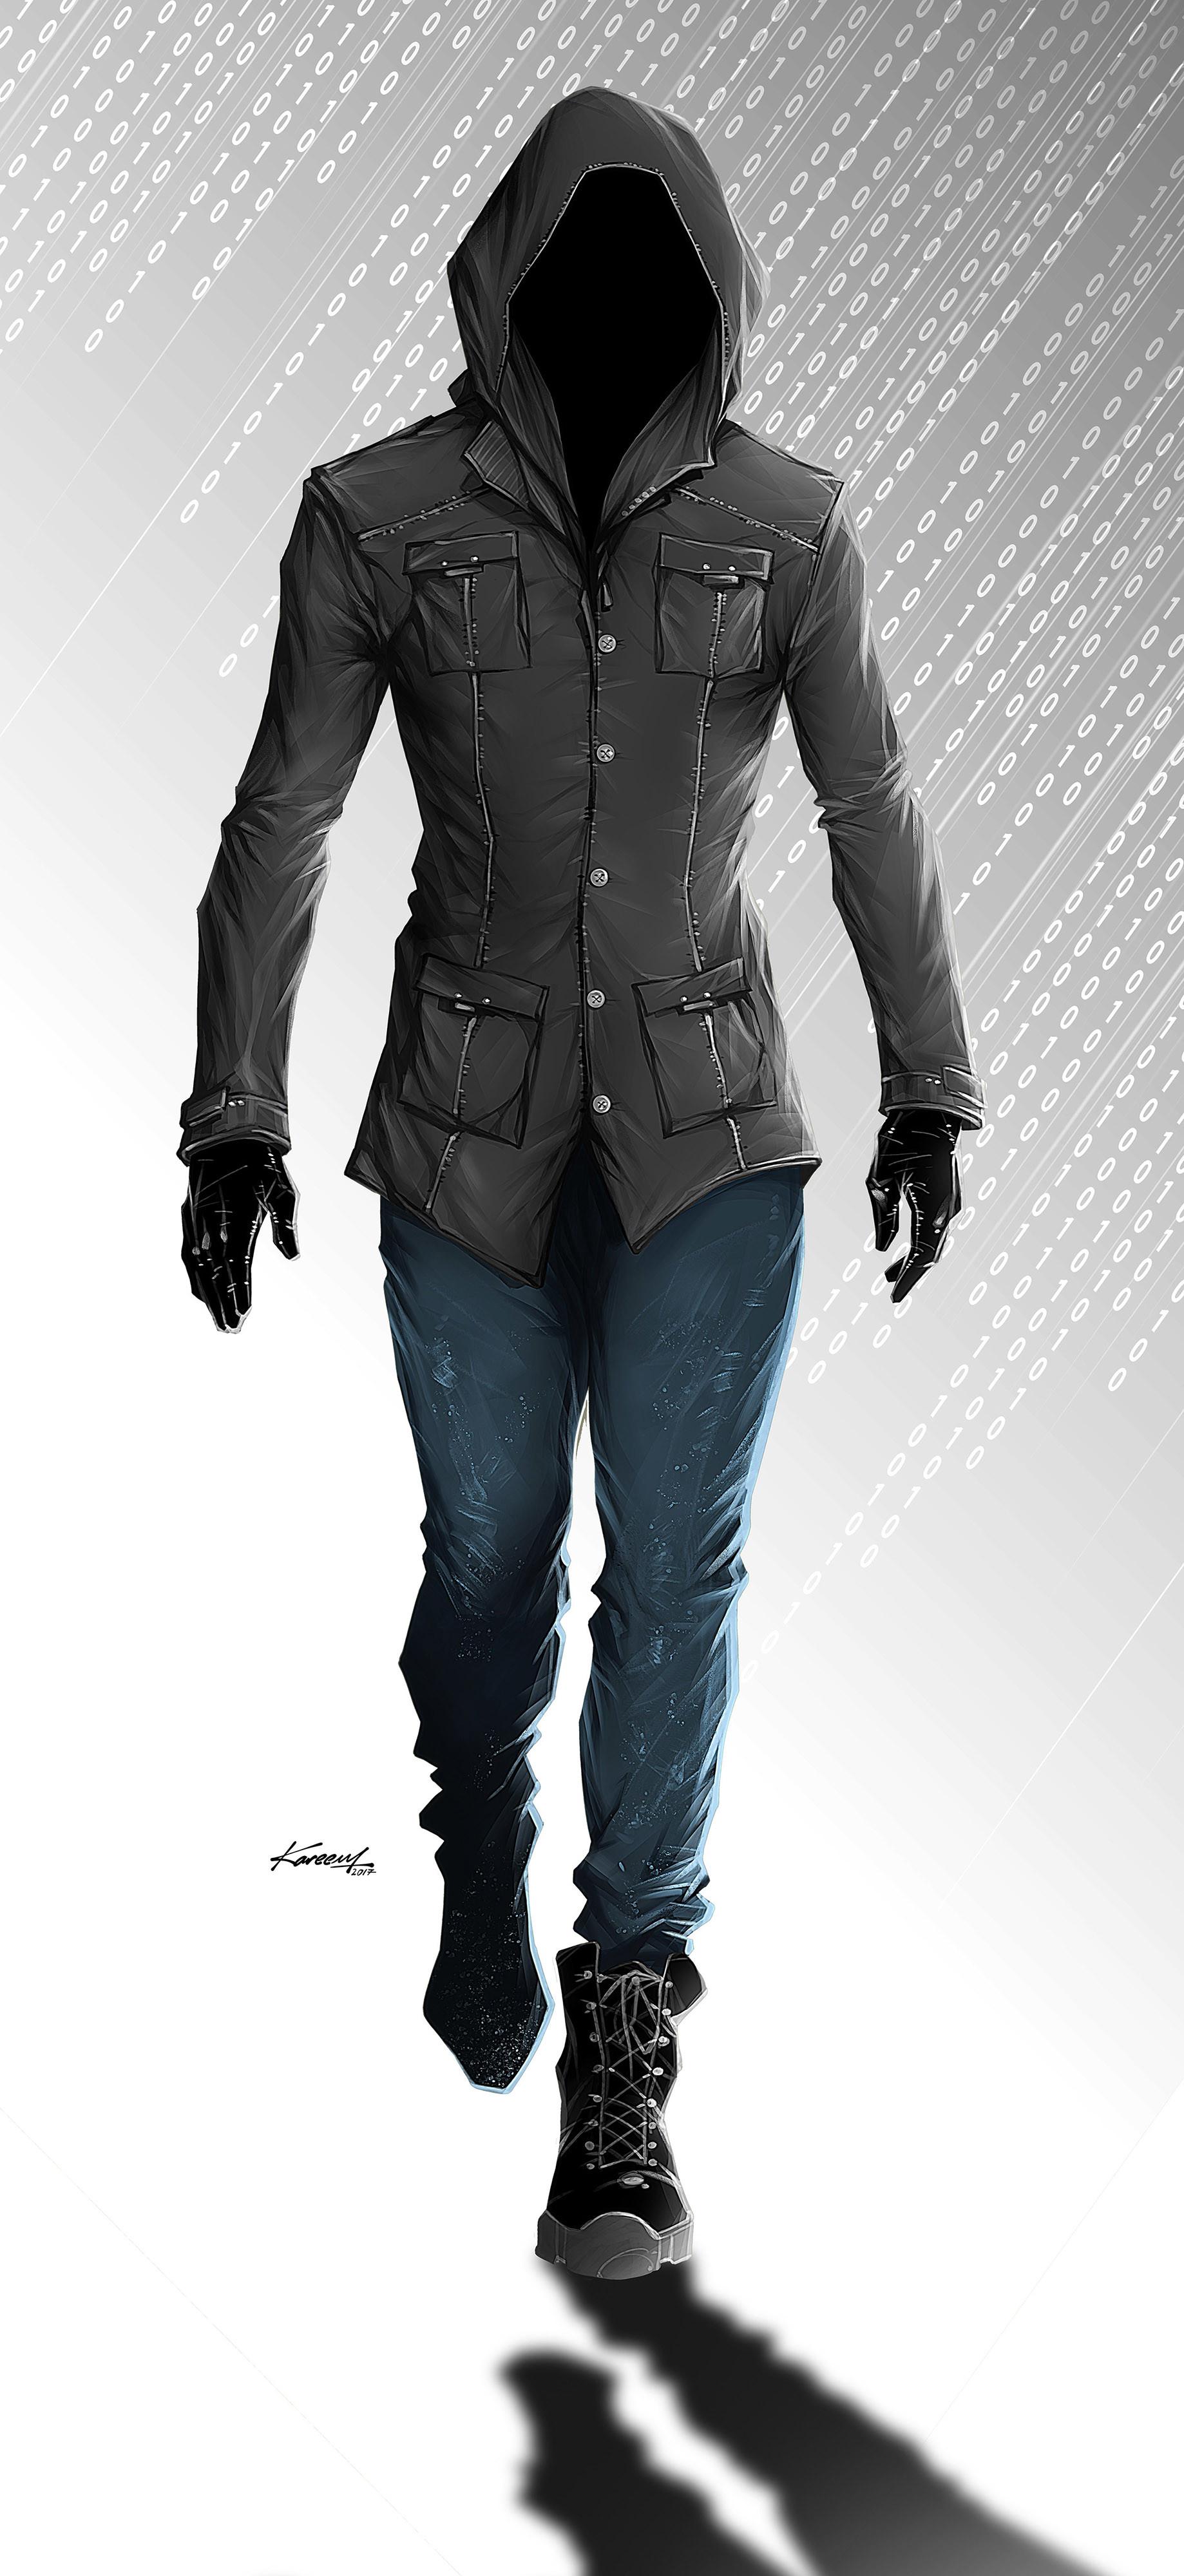 Kareem ahmed el wahee character01